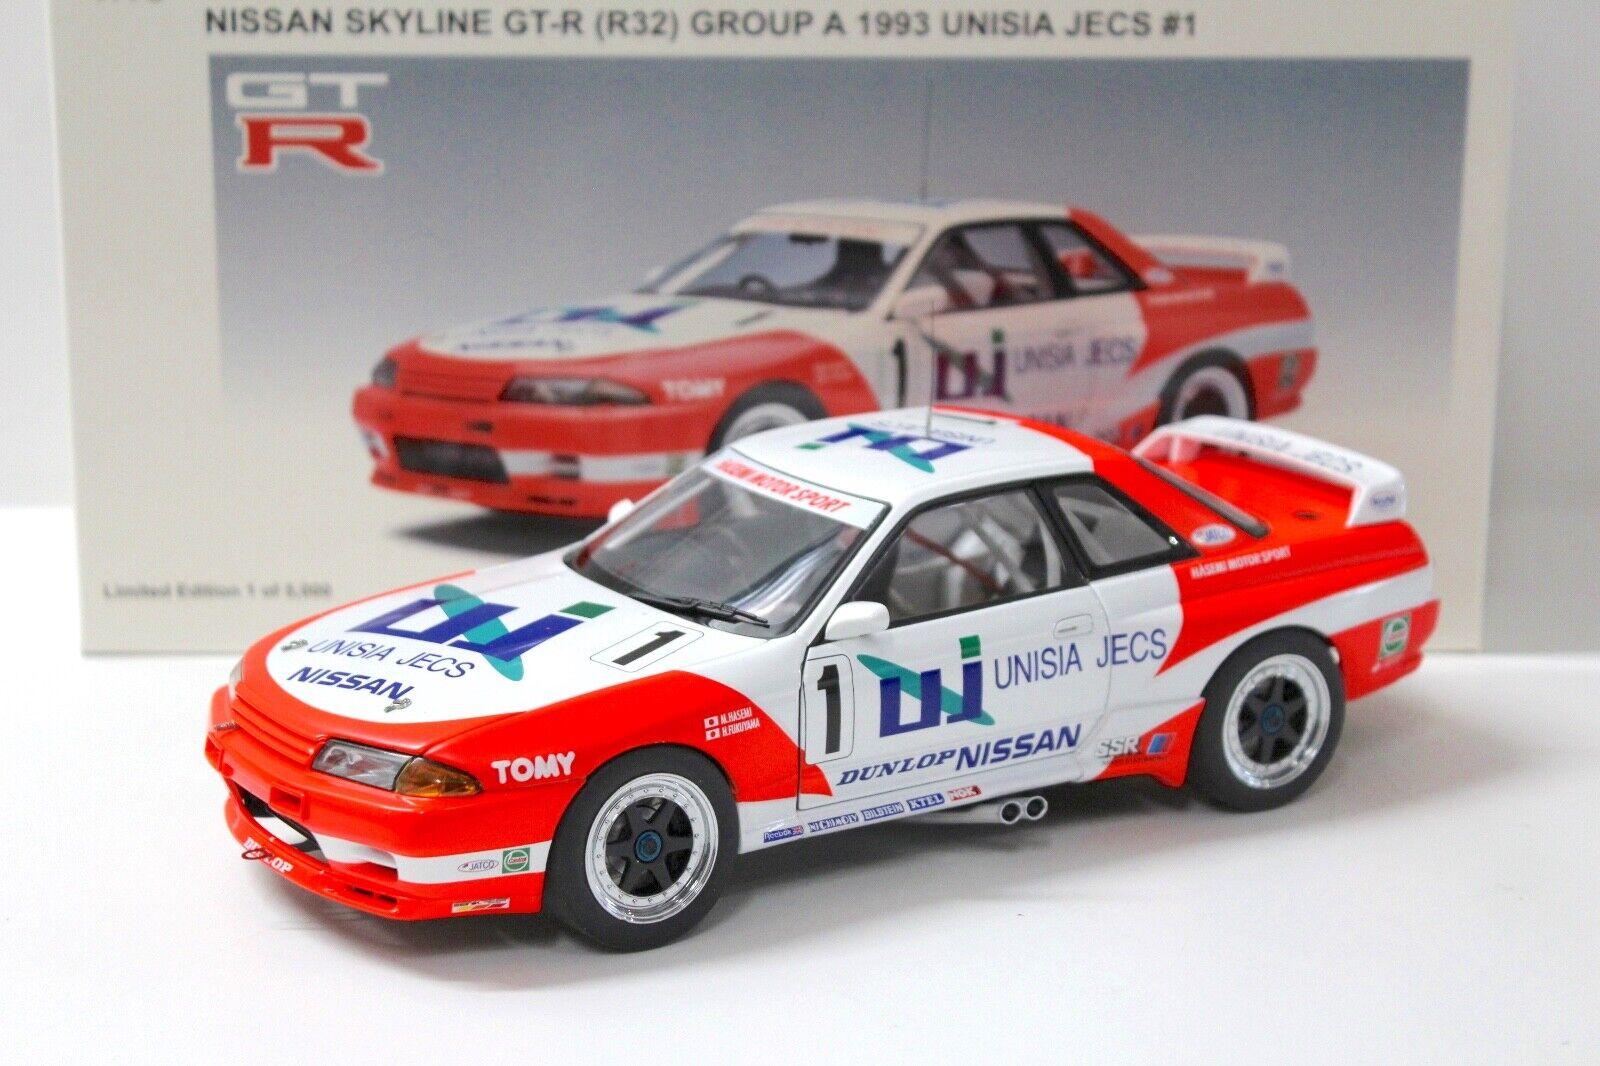 1.18 auto Nissan Skyline GT - R r32 a unisia 35 Cassia 1